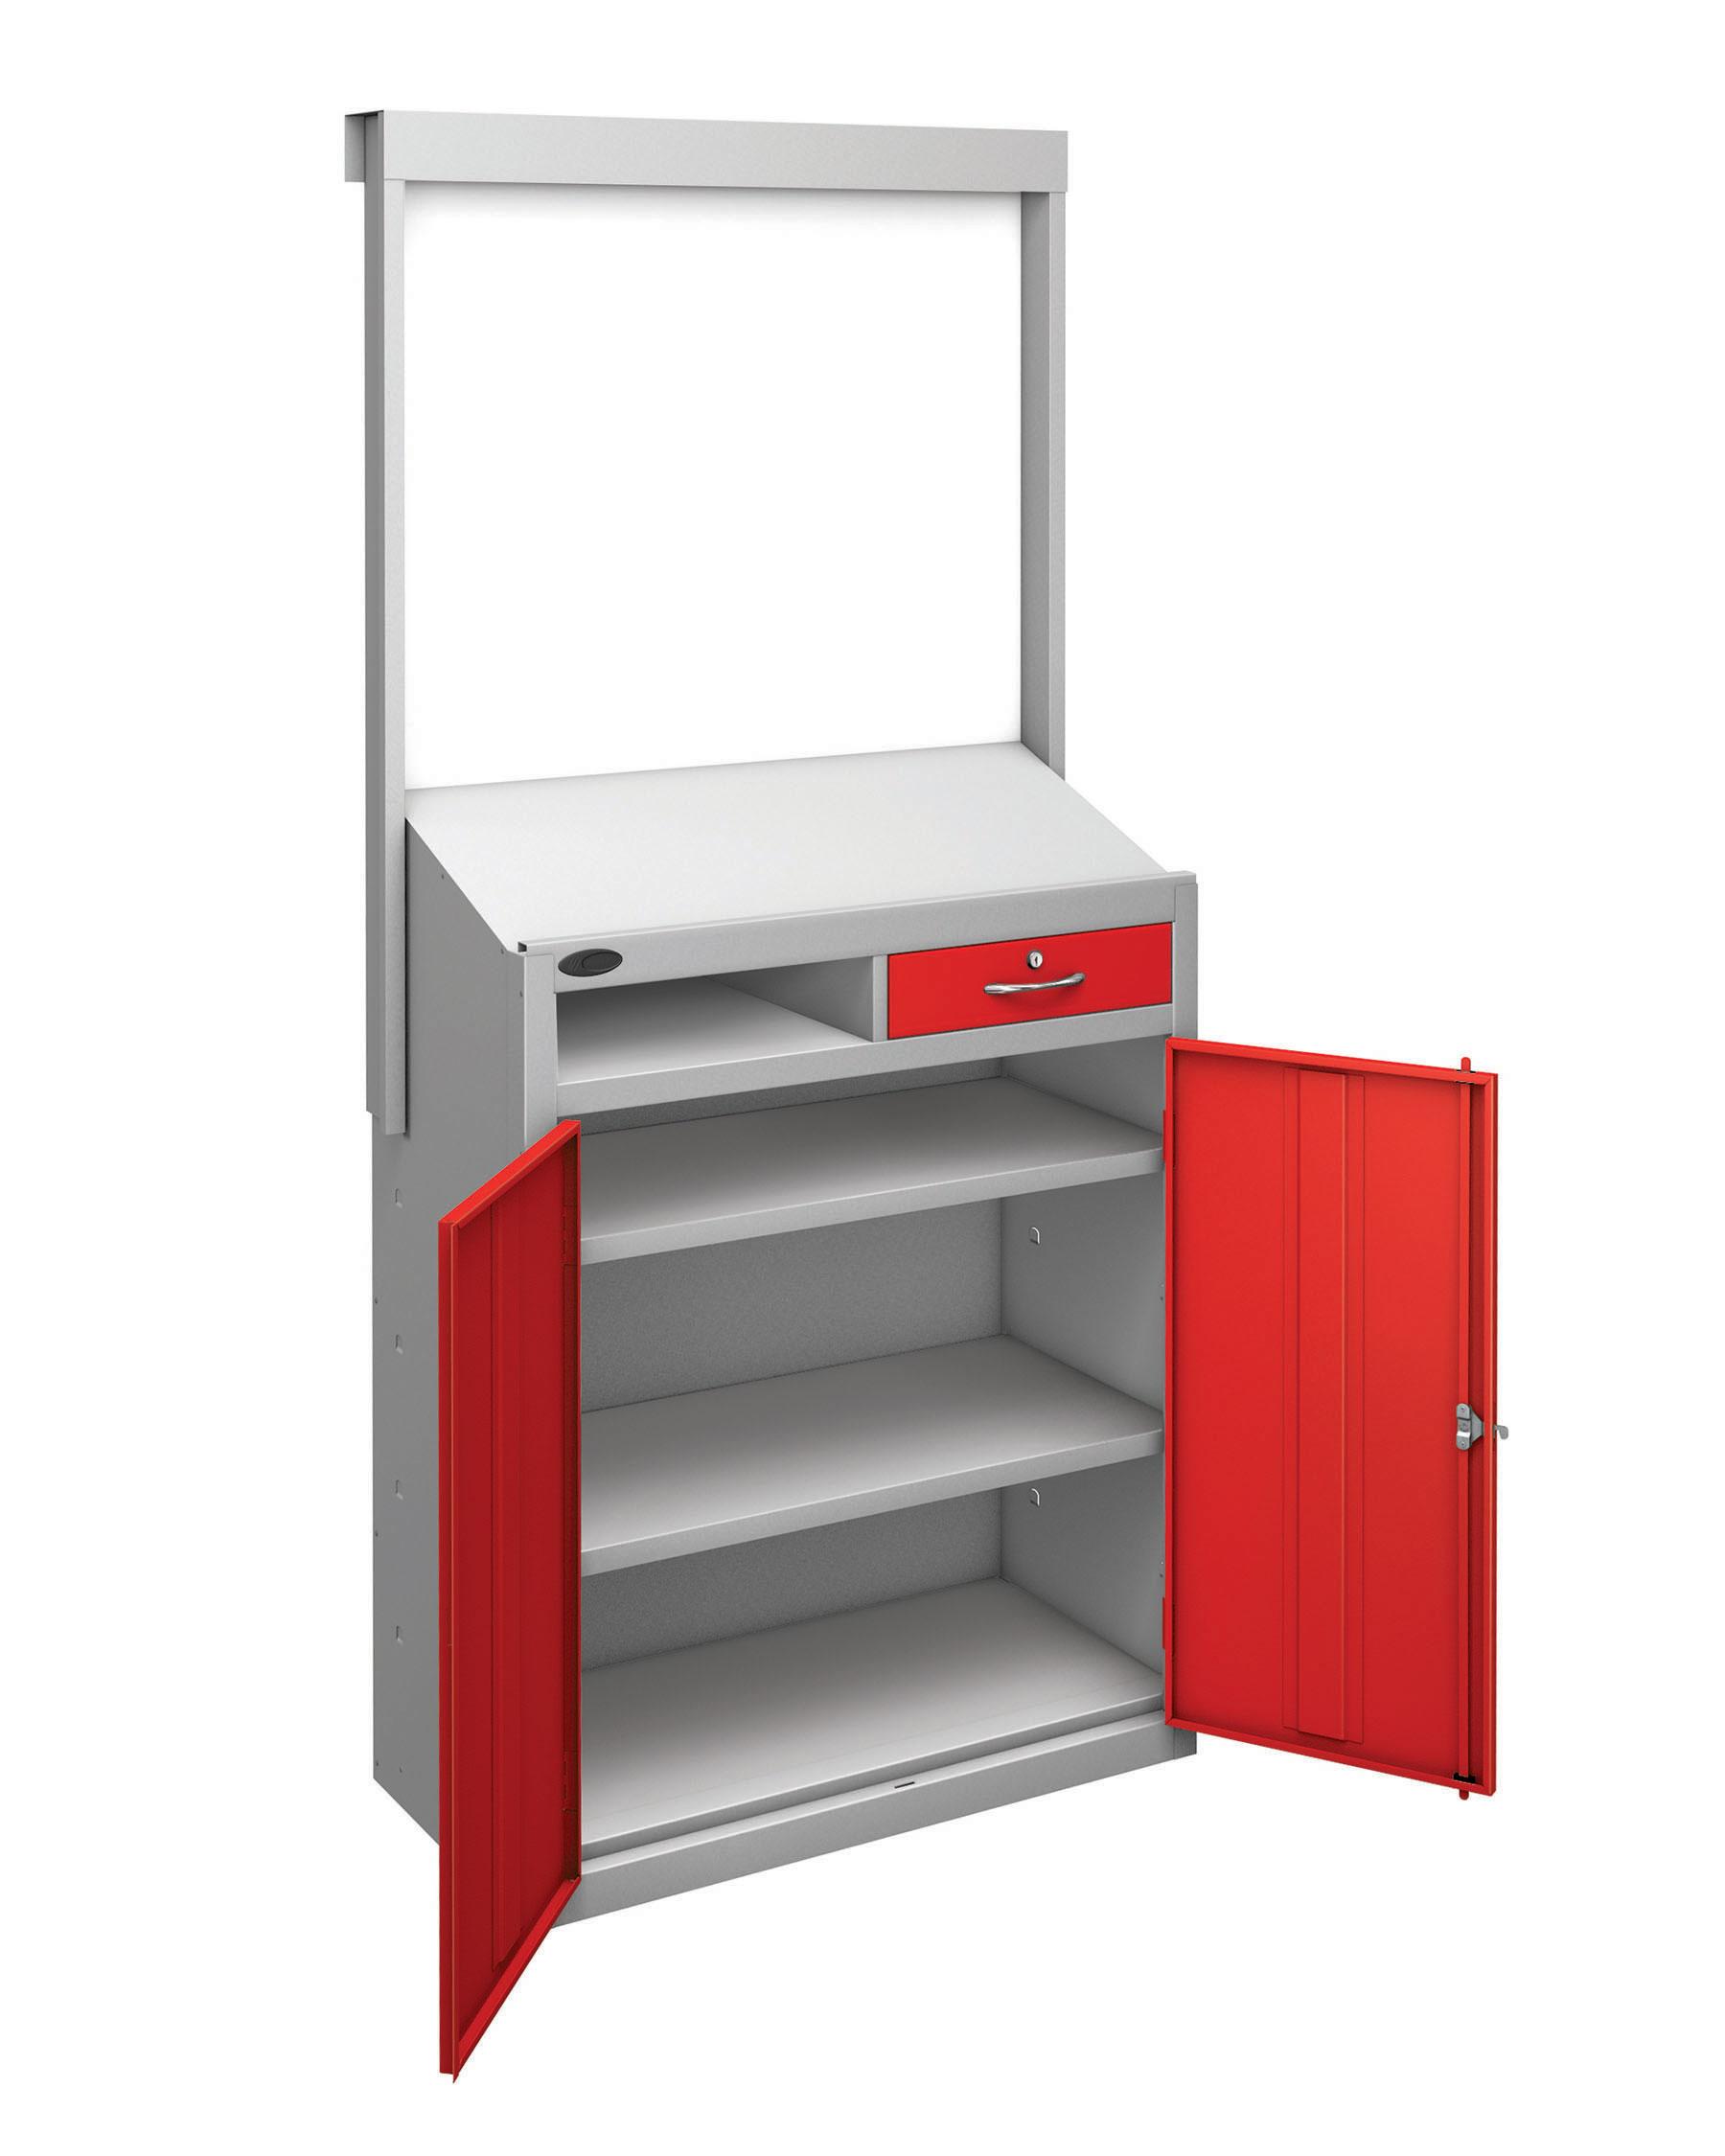 Probe workstation slope whiteboard red